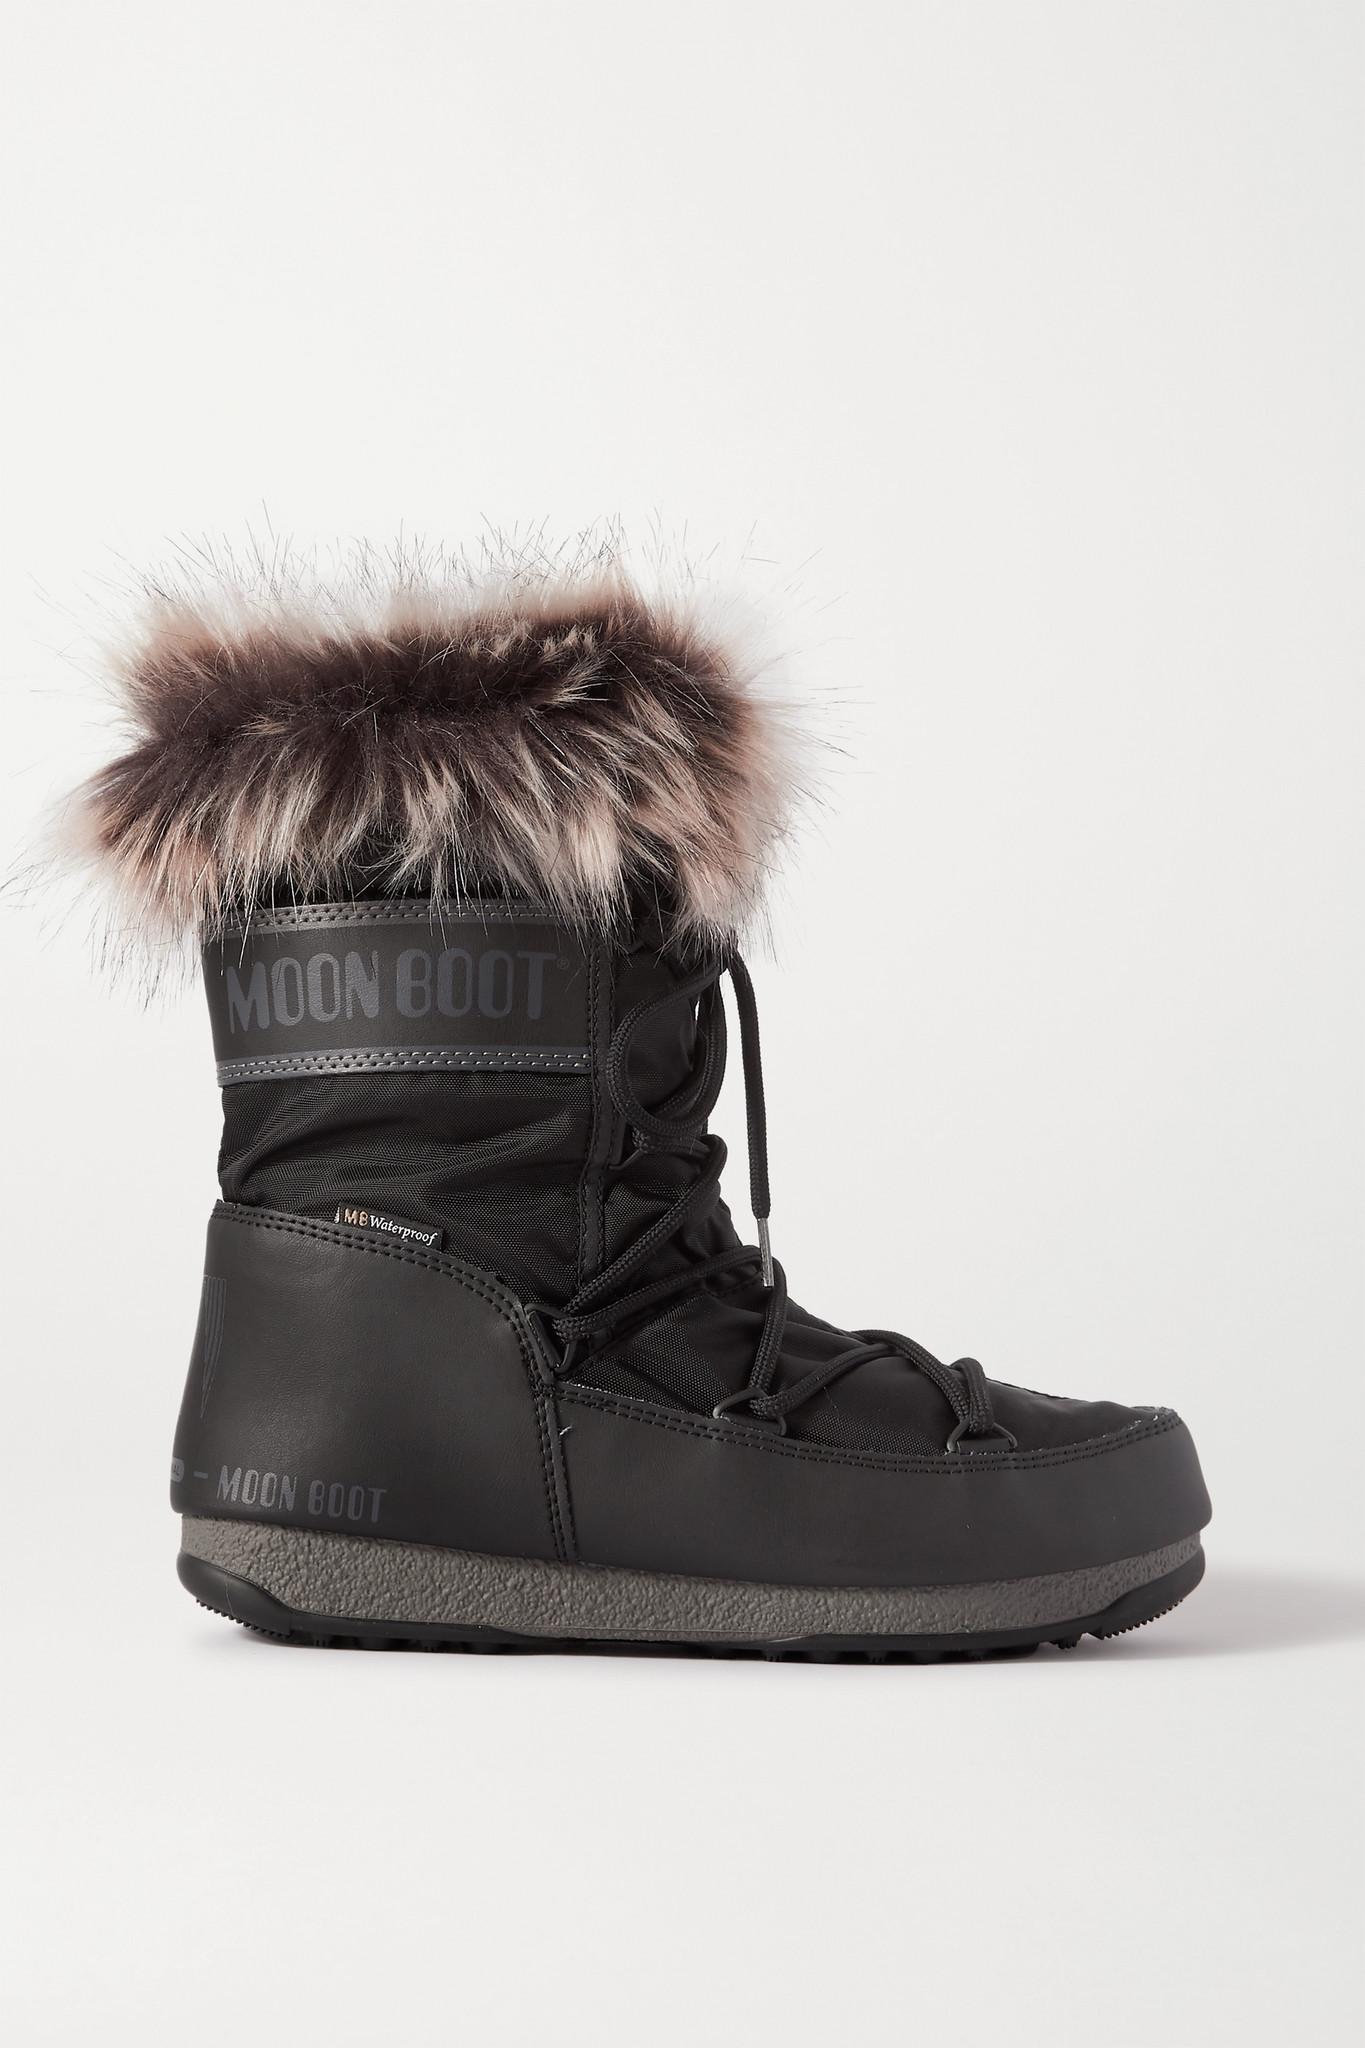 MOON BOOT - Monaco 人造皮草边饰软壳面料人造皮革雪地靴 - 黑色 - IT42